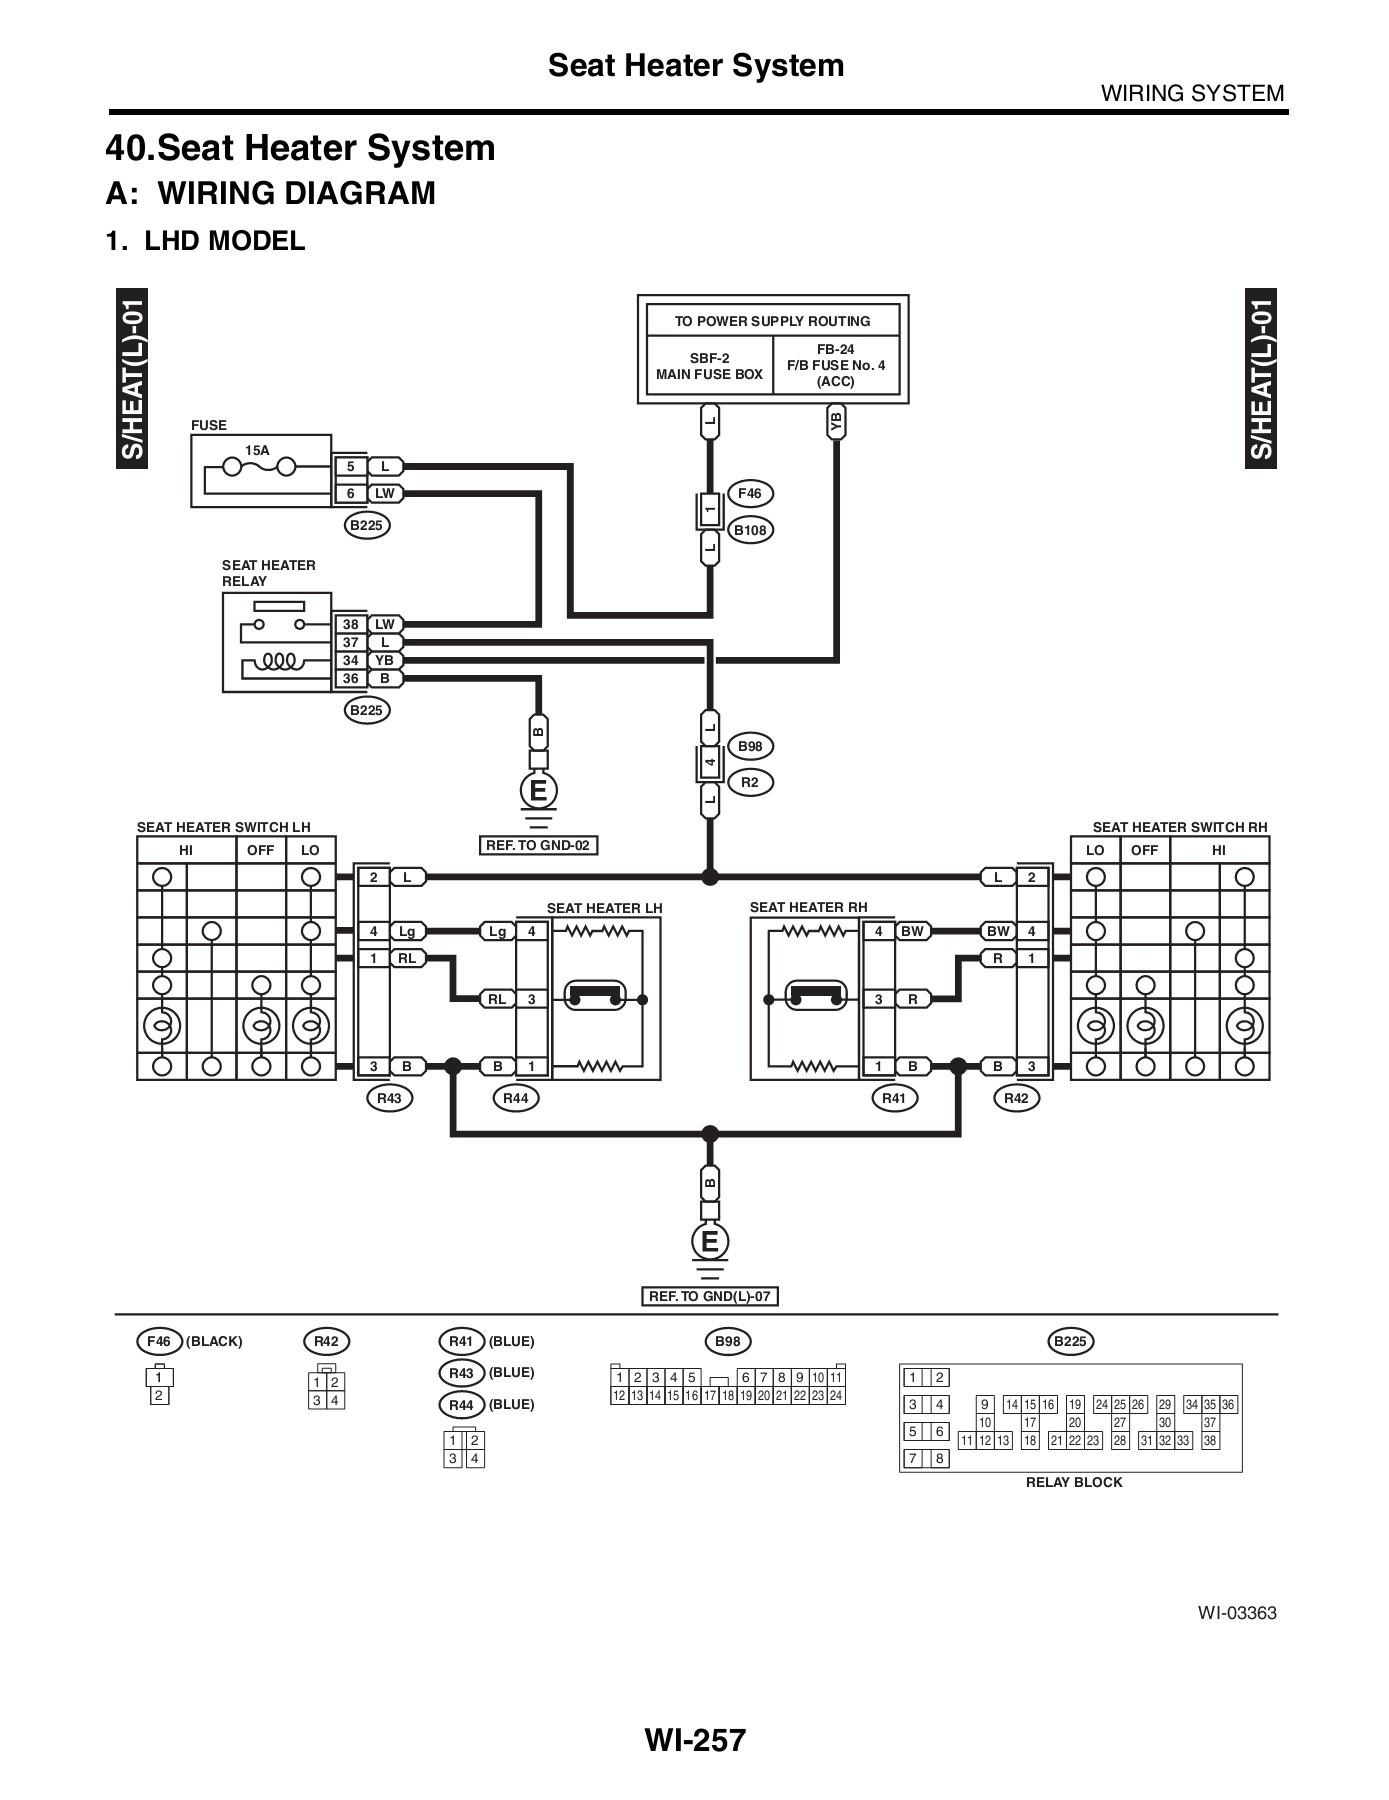 rear defoggercar wiring diagram page 5 [ 1389 x 1800 Pixel ]